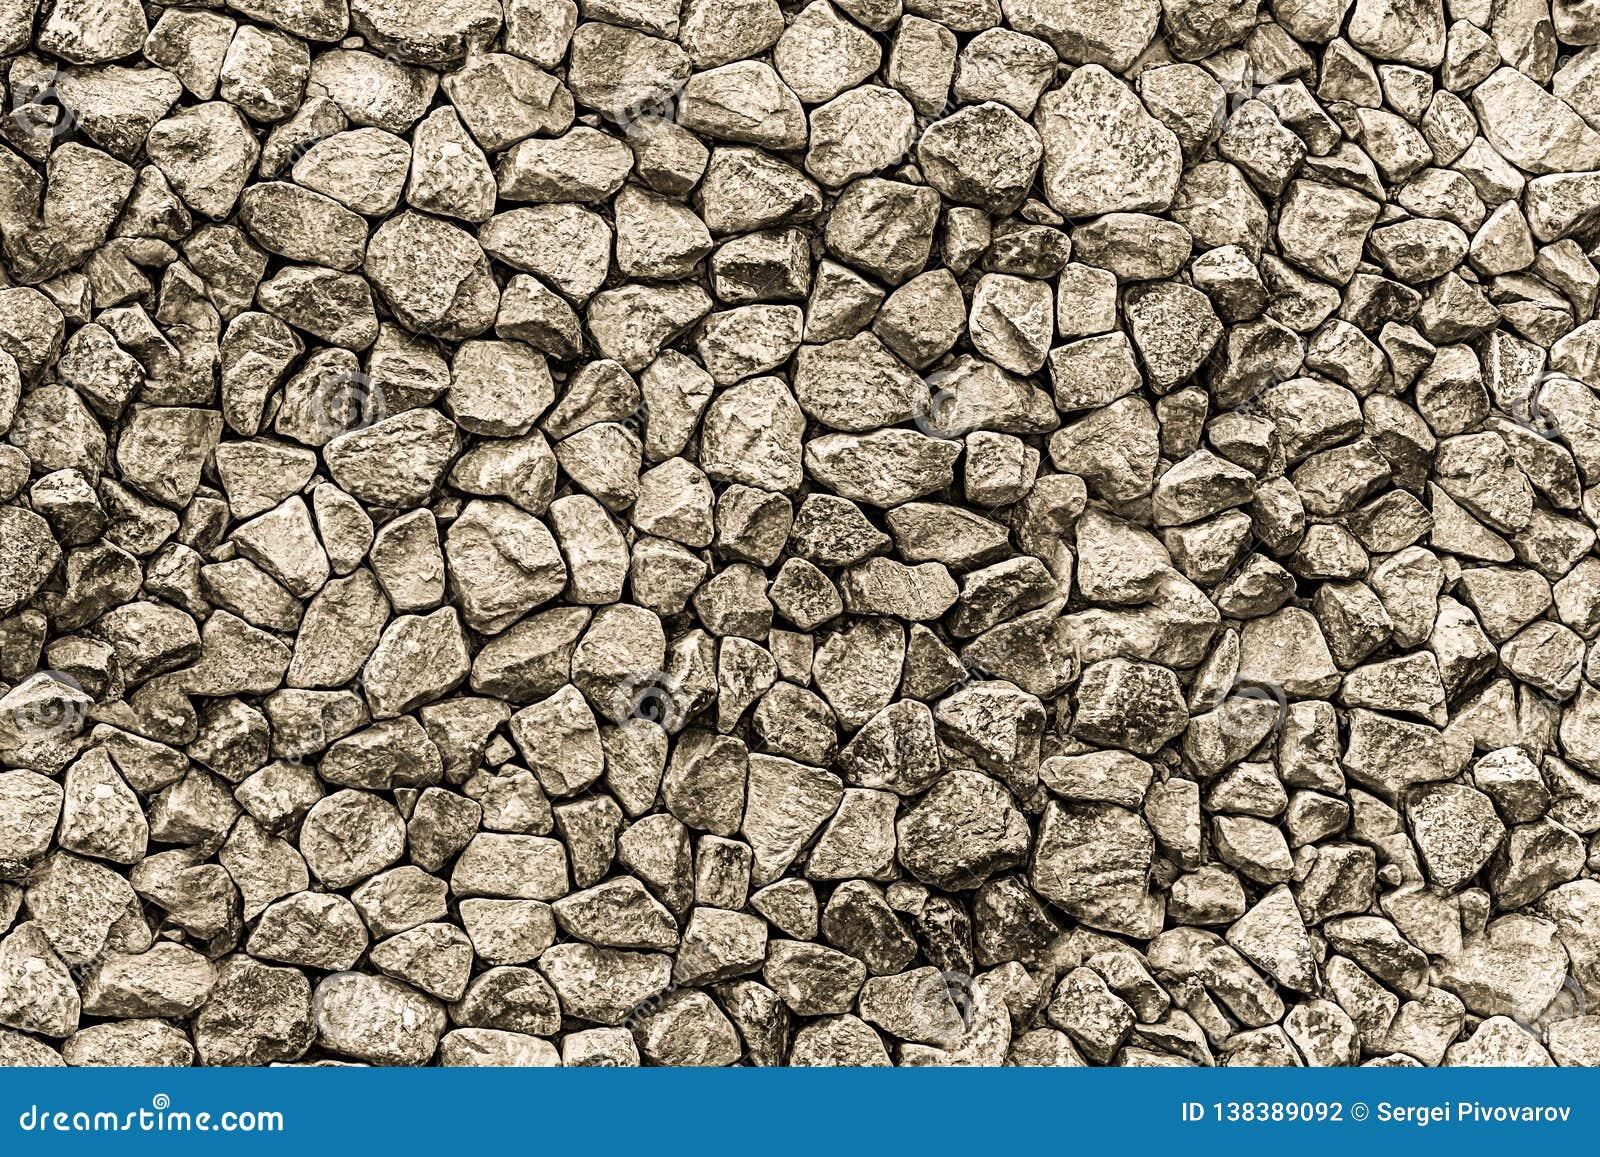 Texture gray hard stone base design grunge gray monochrome luminescent background mini pieces of granite